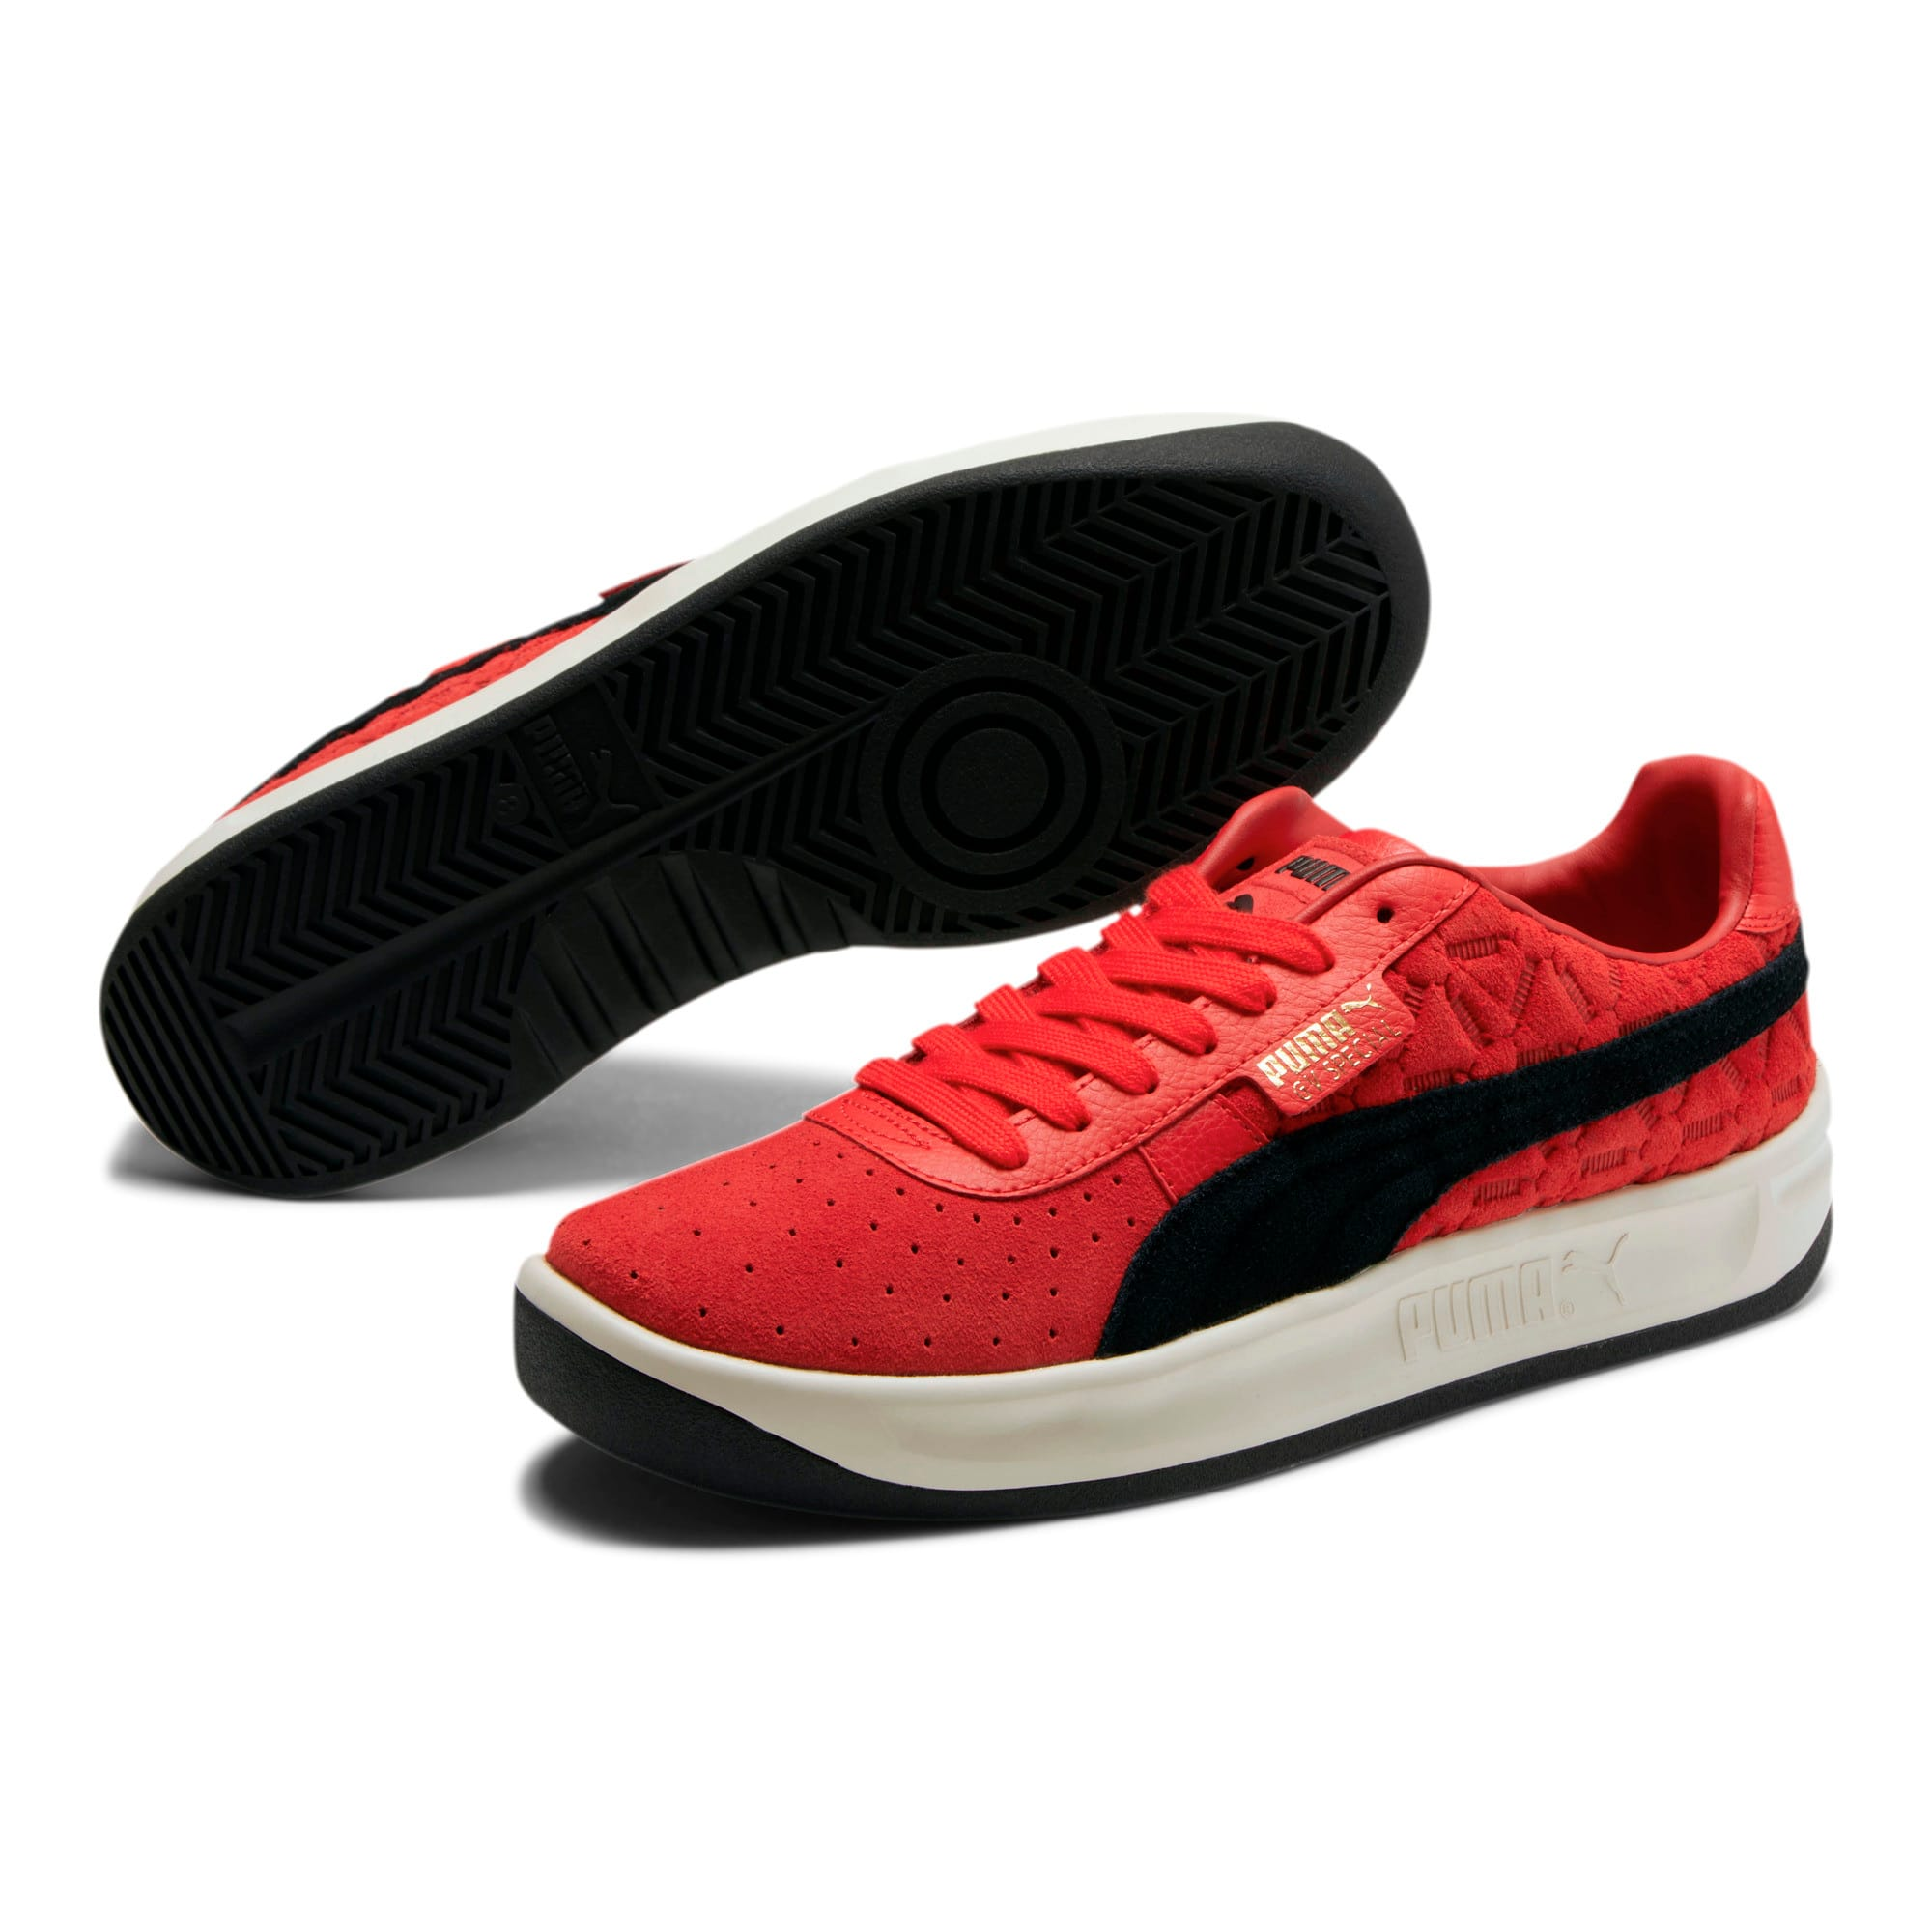 Miniatura 2 de Zapatos deportivos GV SpecialLux, HighRiskRed-P Blk-WhisperWht, mediano